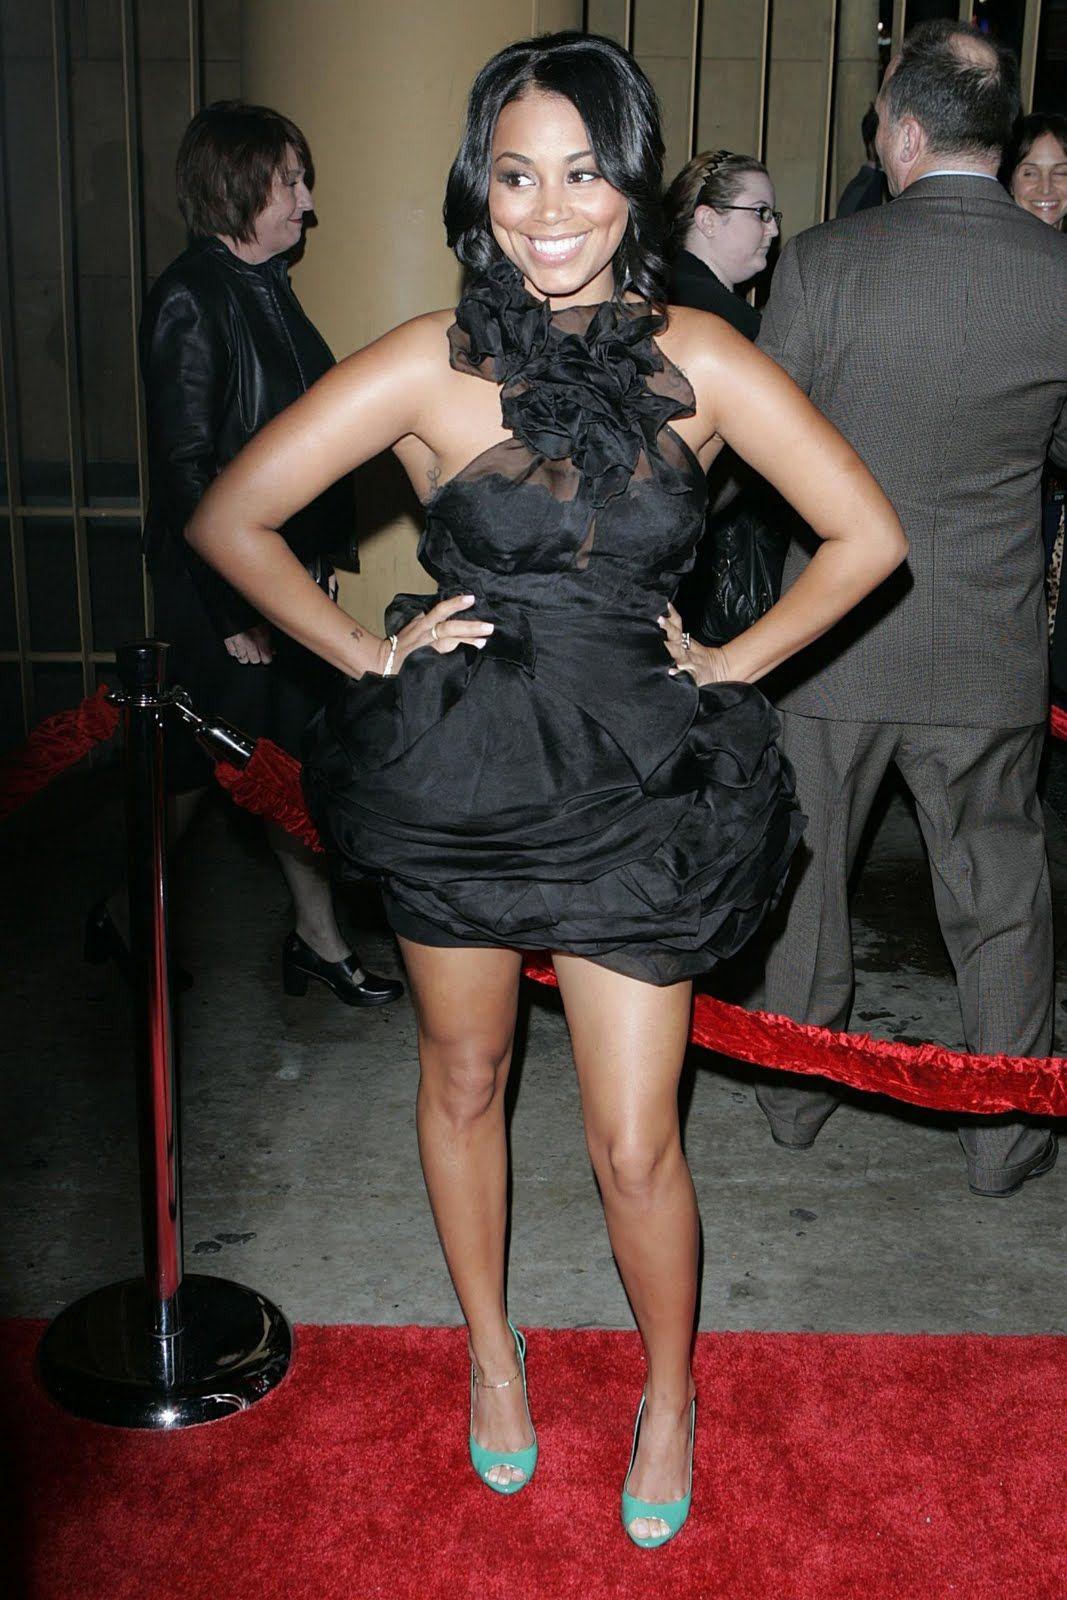 Laurenlovesmakeup Xoxo Primark Pound Fashion Nails: Ms. Lauren London ...XoXo